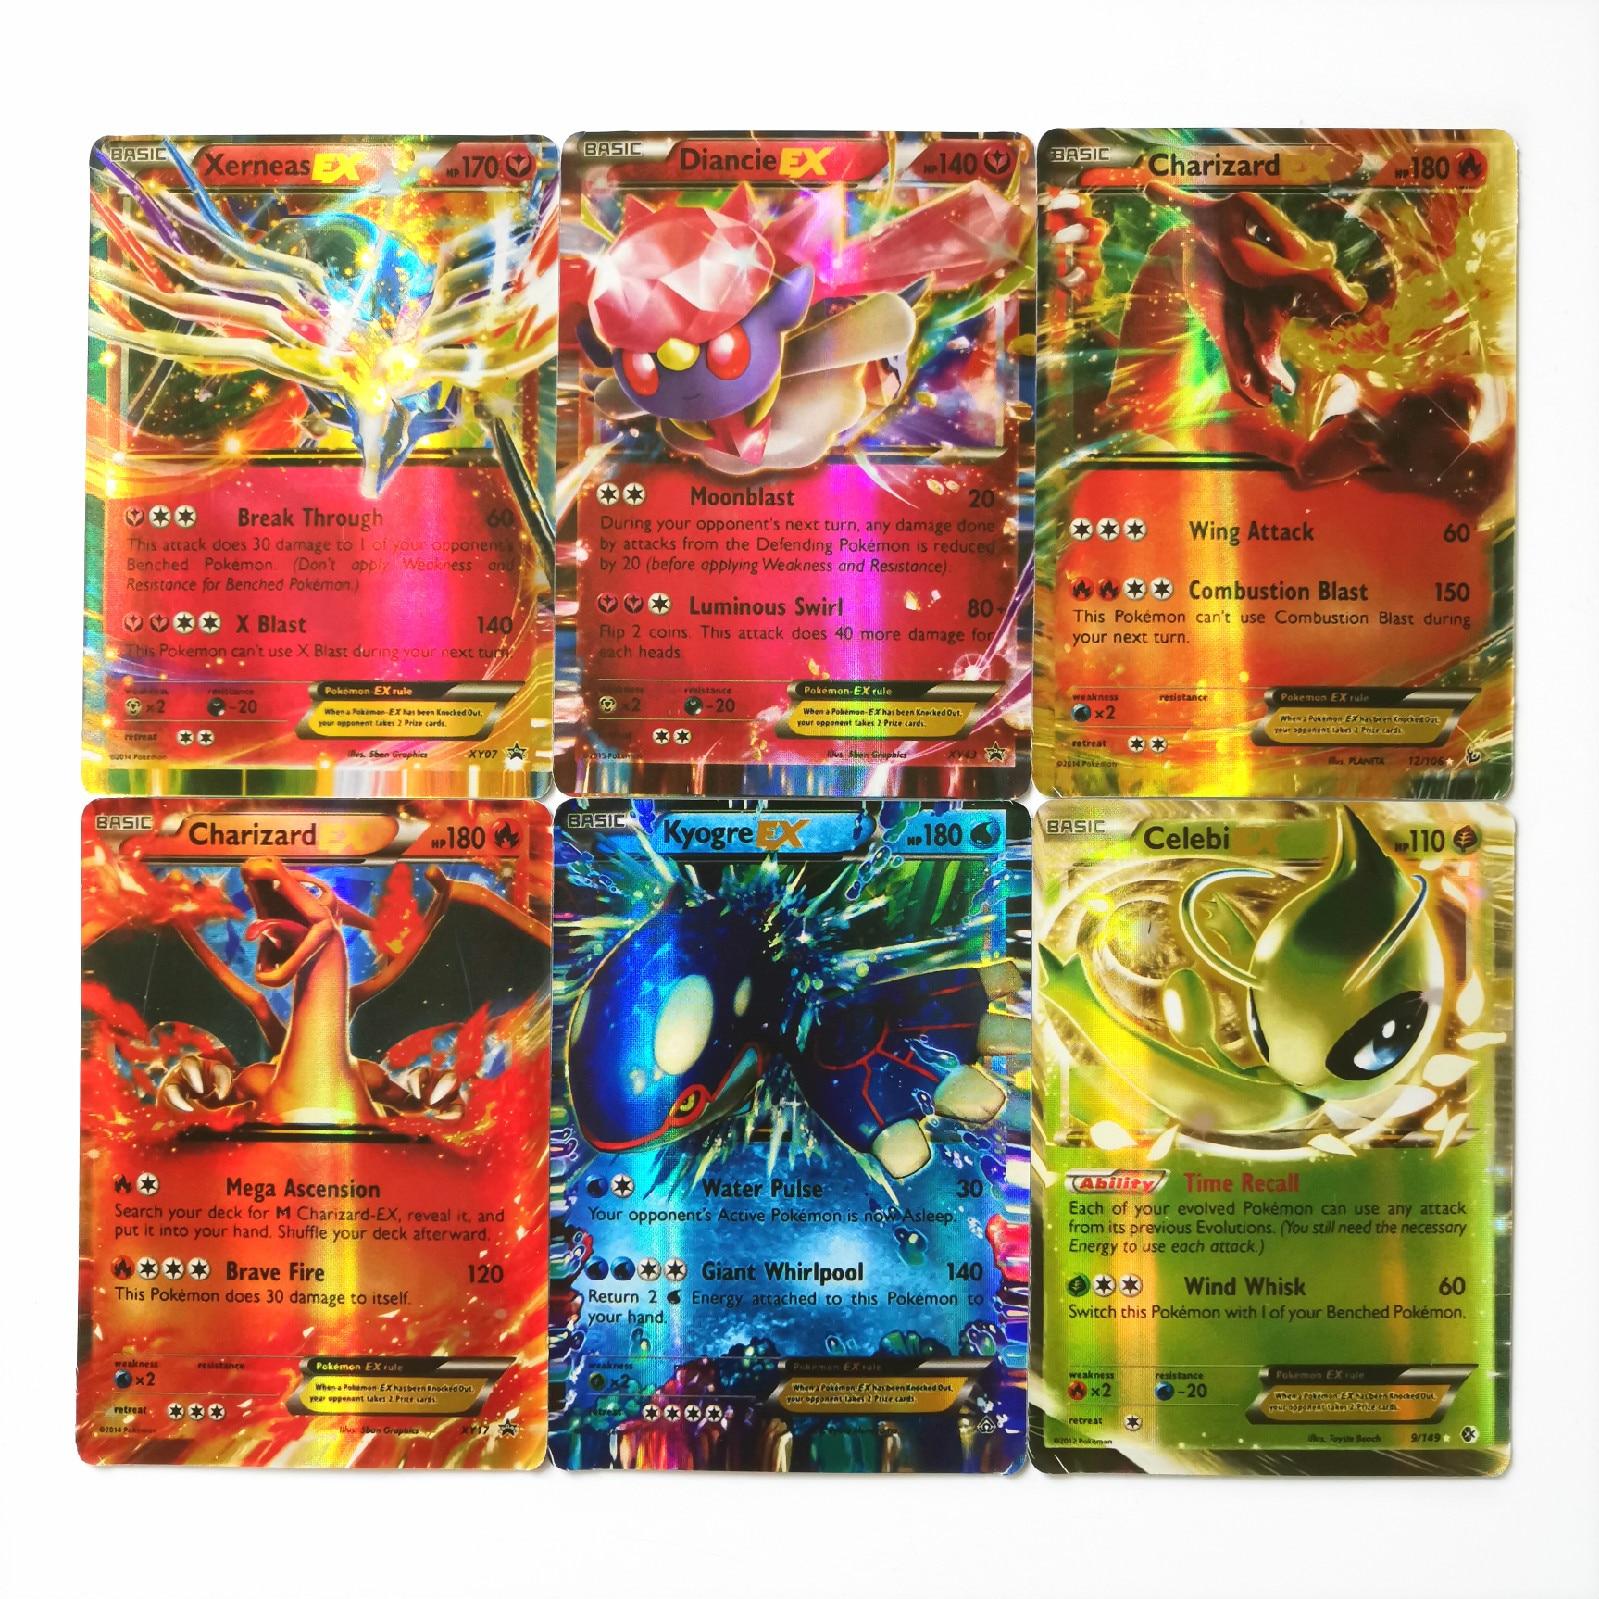 Pokemon EX Shining TAKARA TOMY Cards Game Battle Carte 100pcs Trading Toys For Children